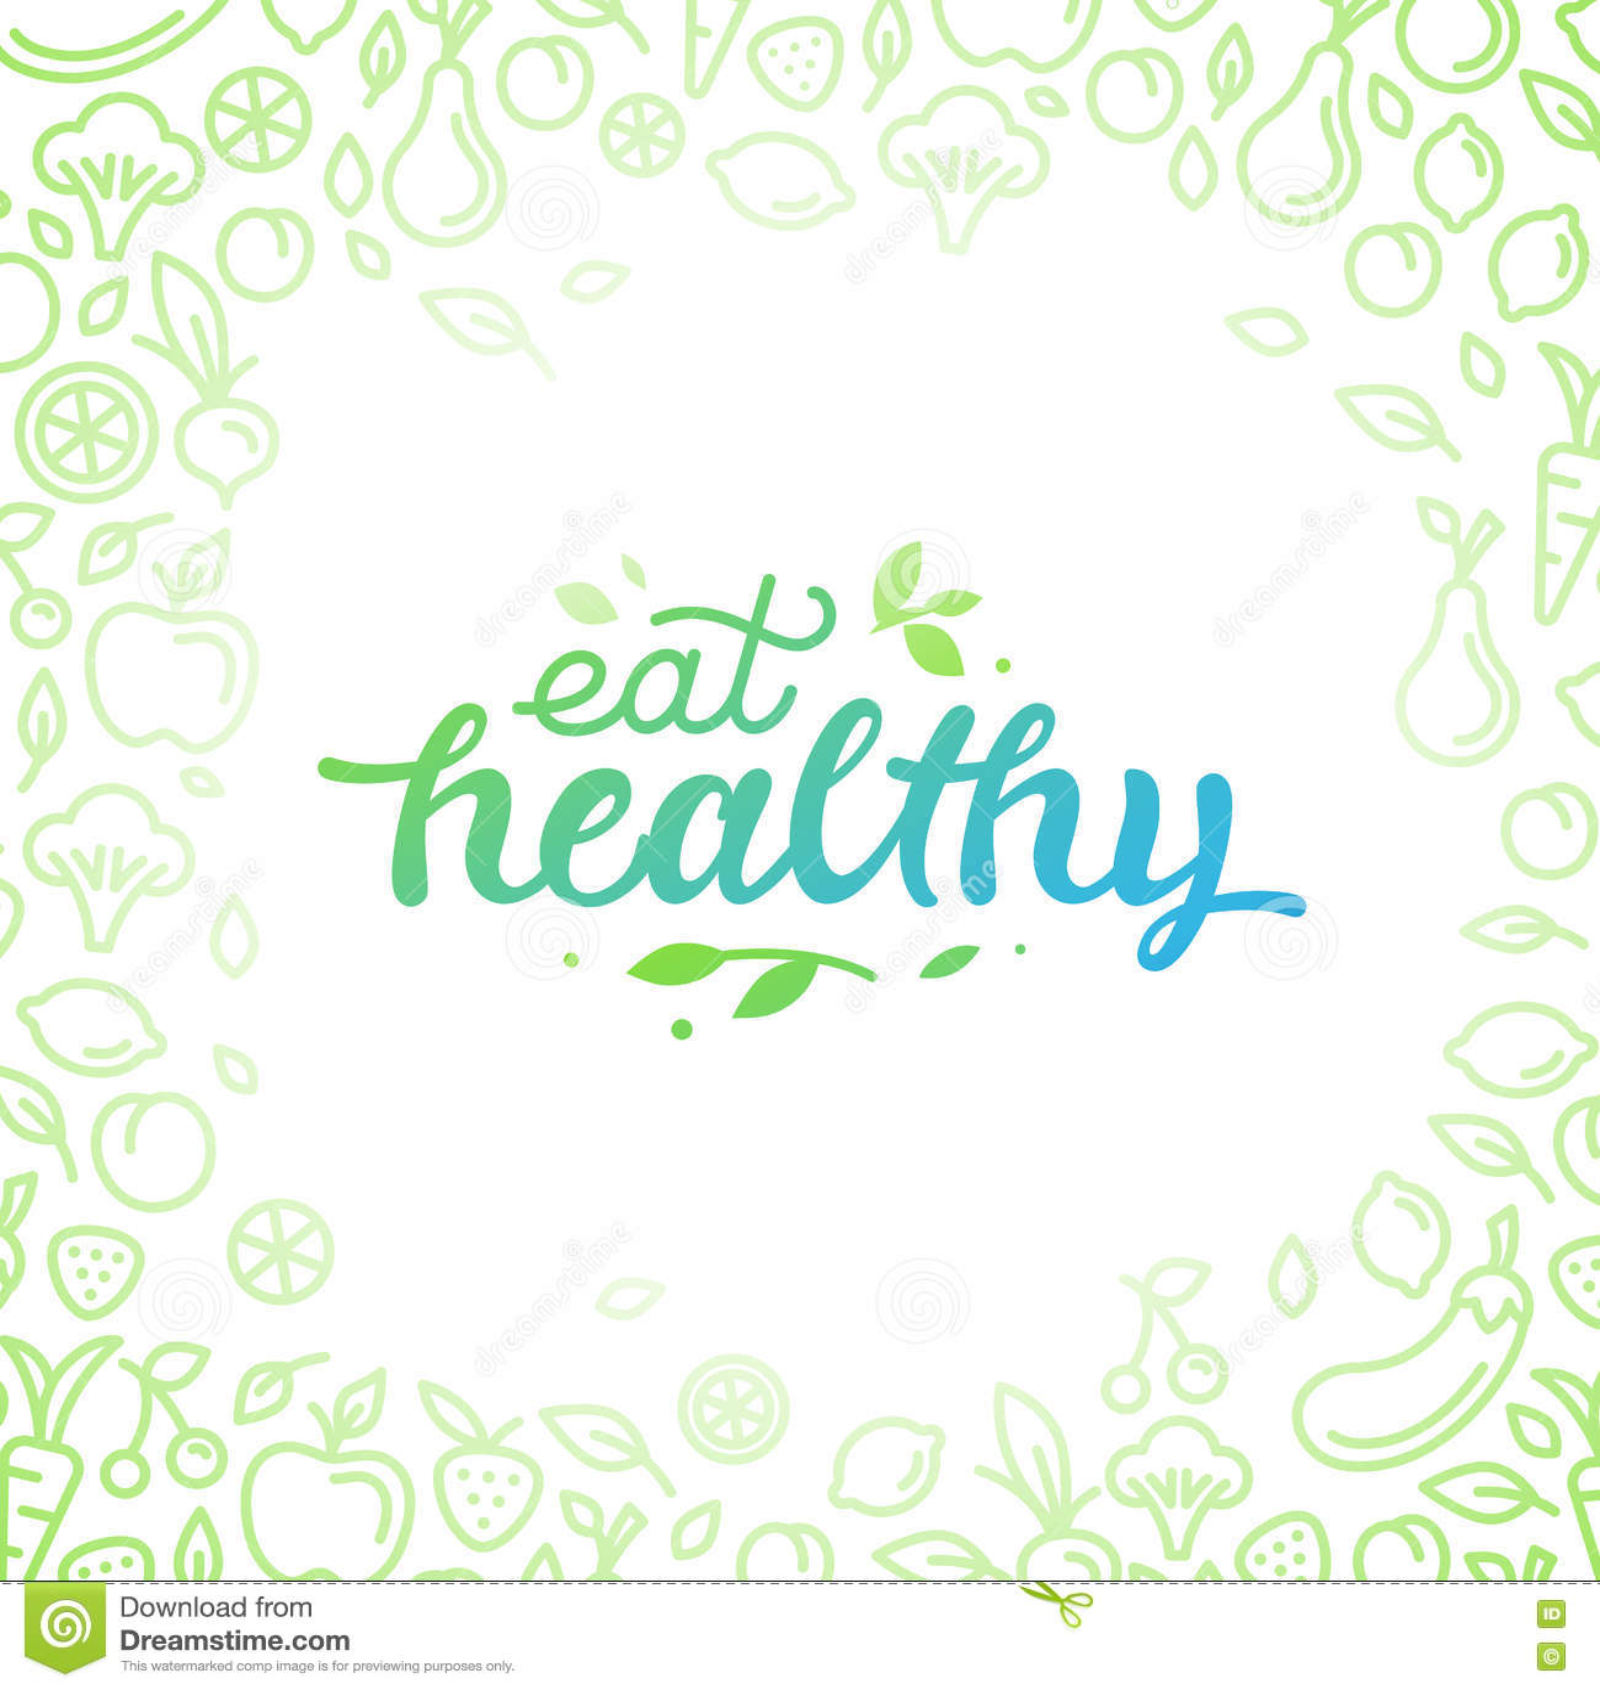 Eat healthy - motivational poster or banner